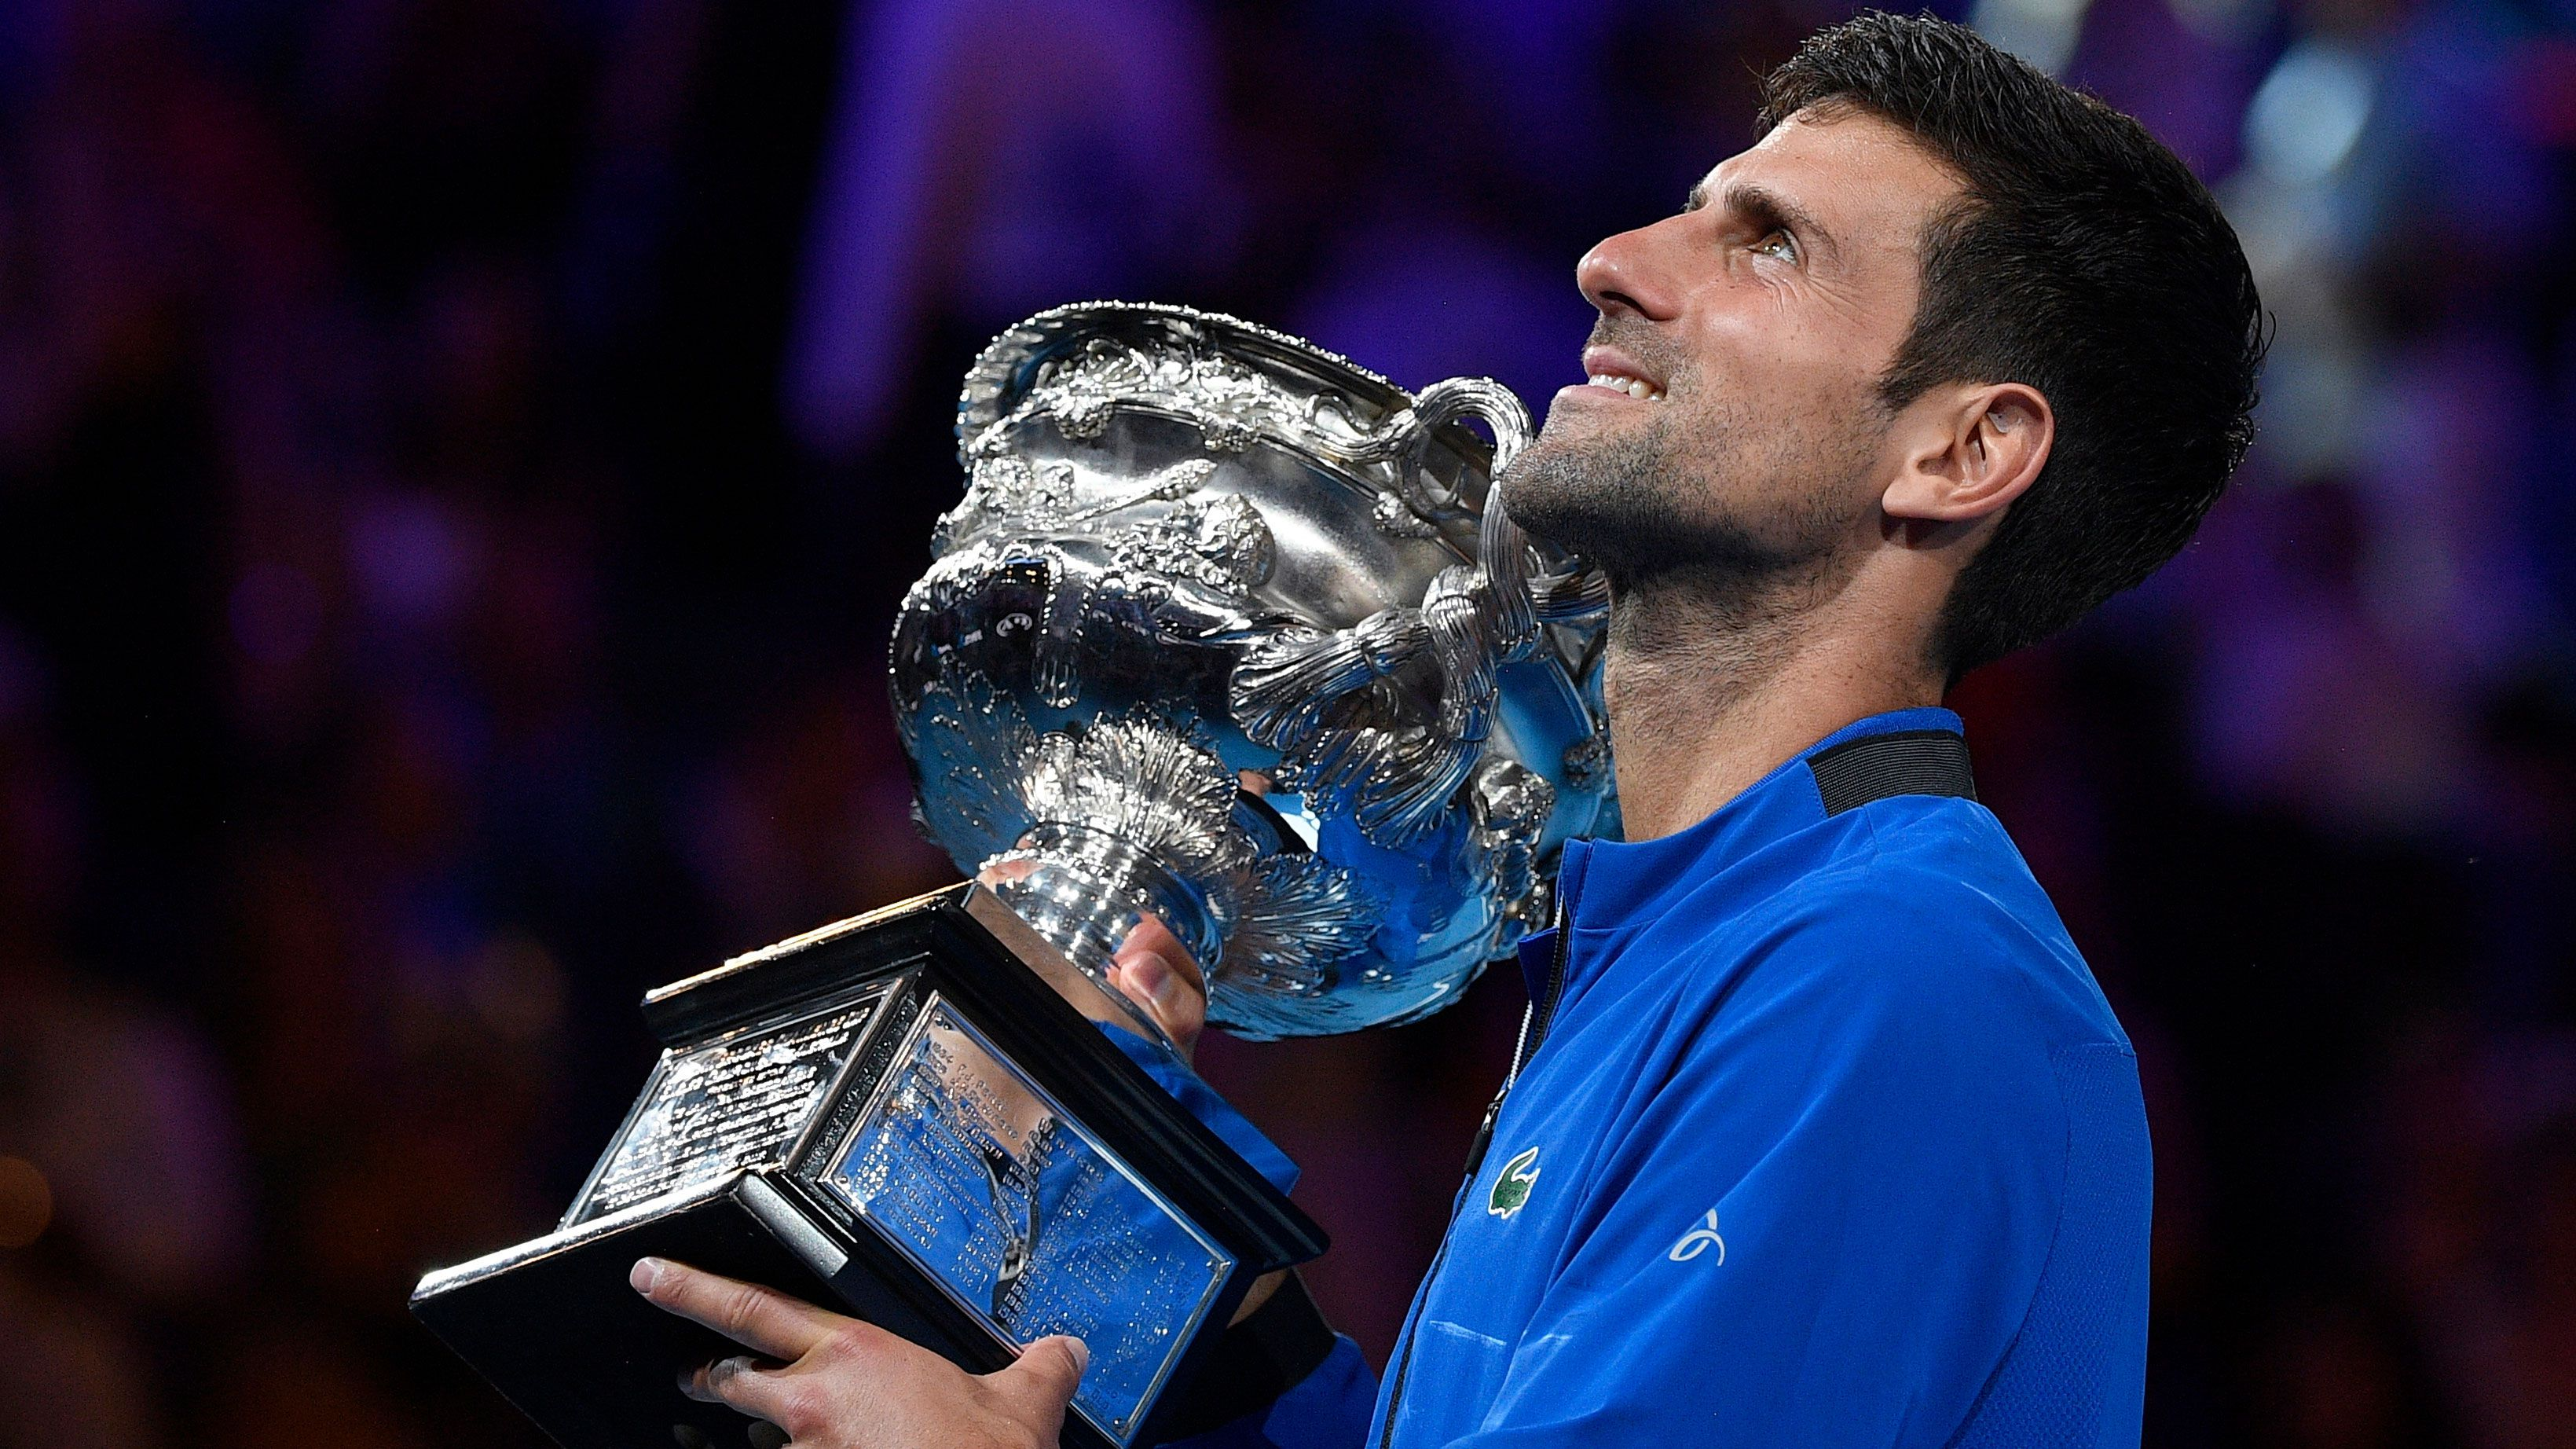 Novak Djokovic sets incredible marks after winning seventh Australian Open championship